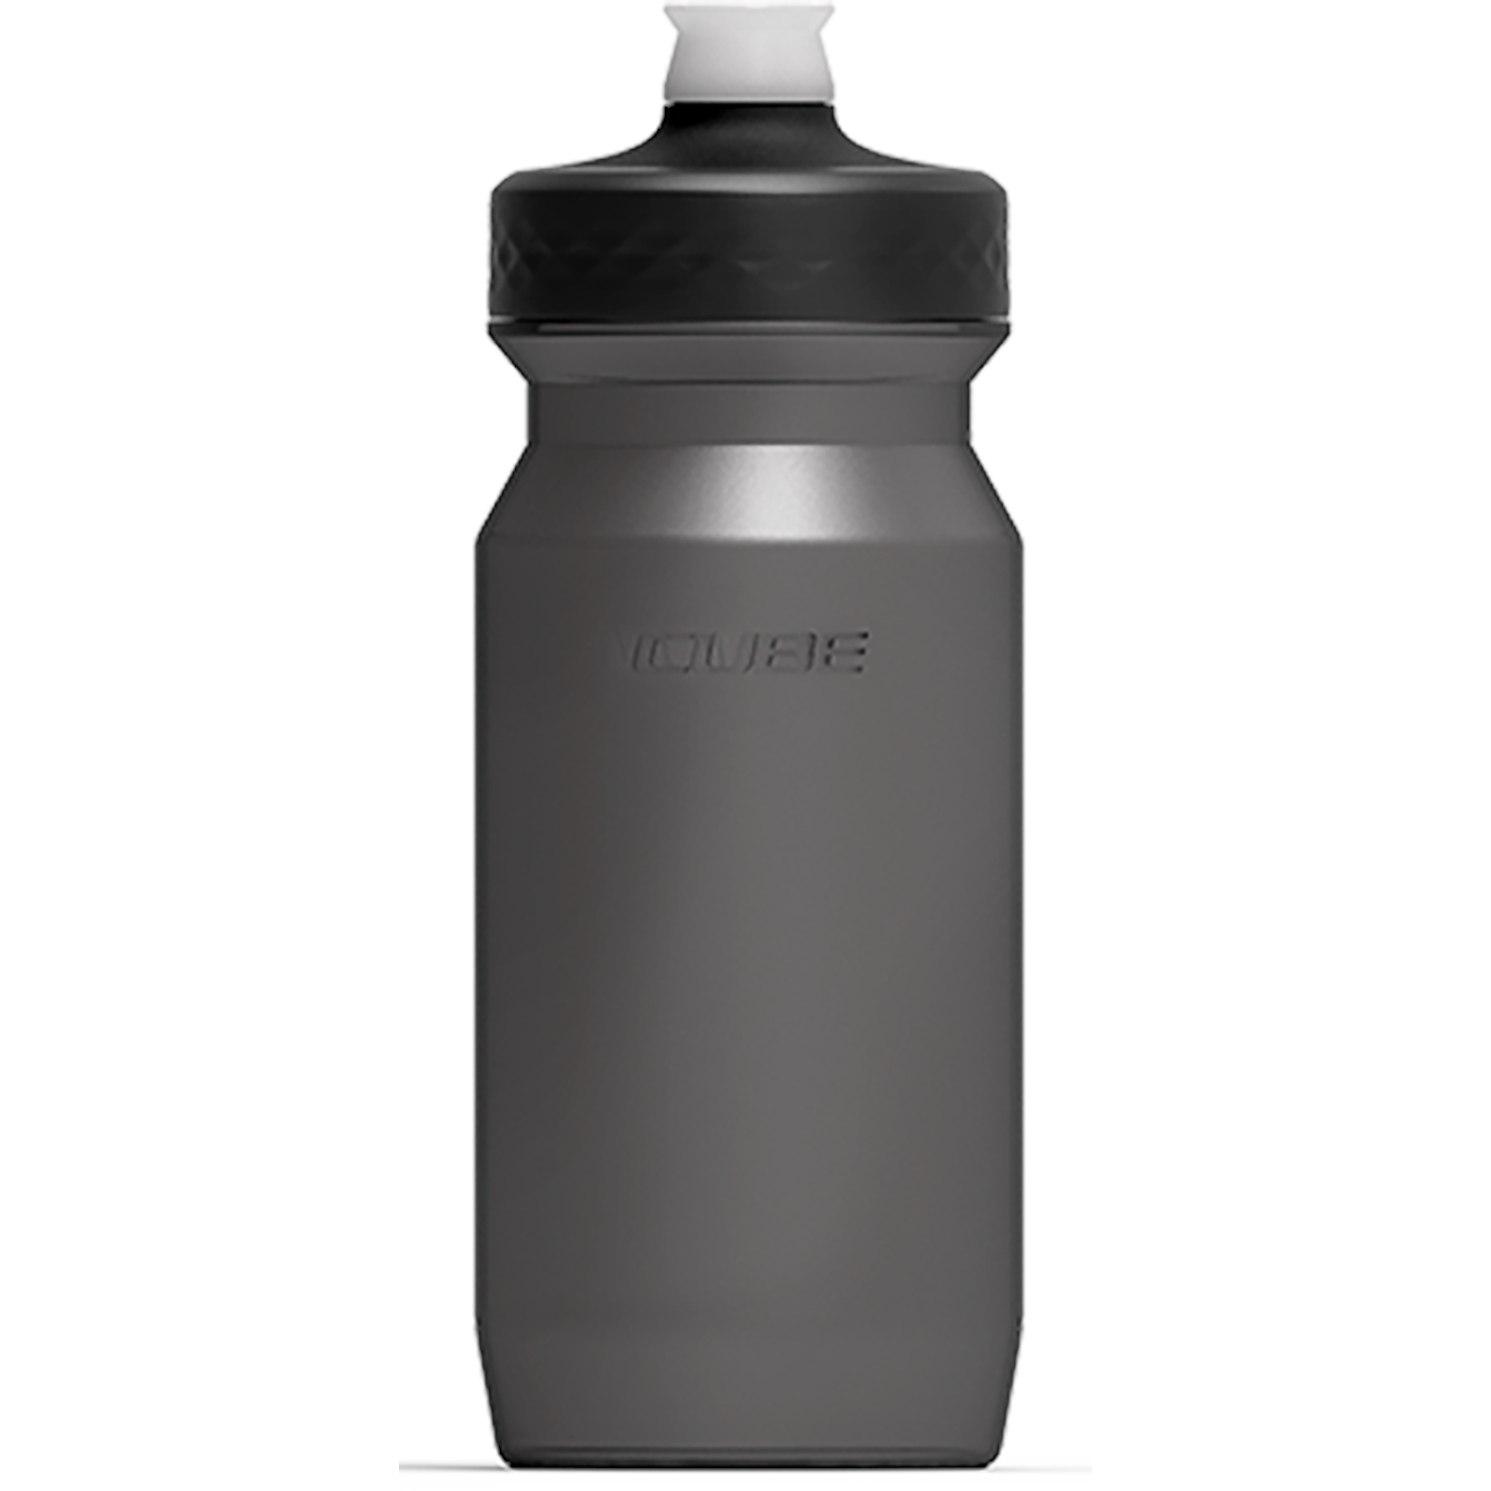 Image of CUBE Bottle Grip 0.5l - black 2020